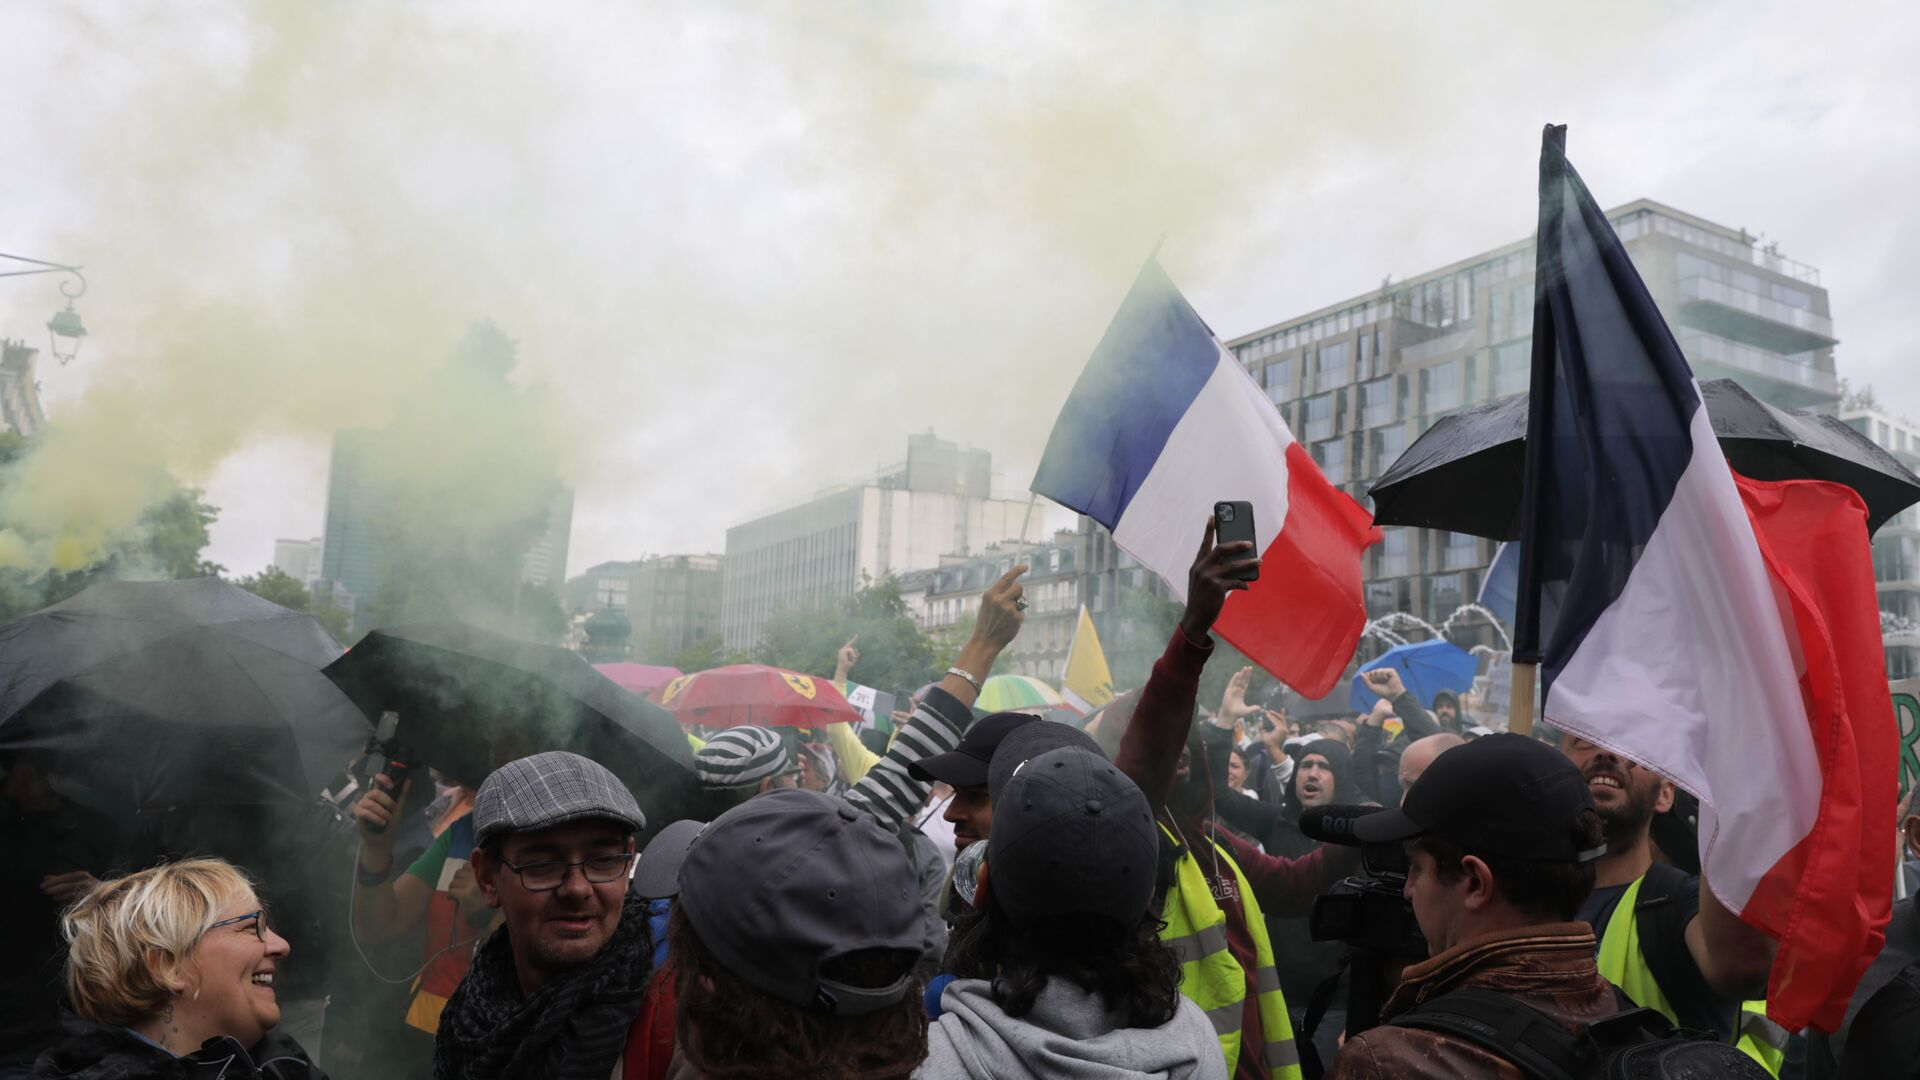 Протестующие против вакцинации и вакс-паспортов во время демонстрации в Париже, Франция - Sputnik Polska, 1920, 18.09.2021